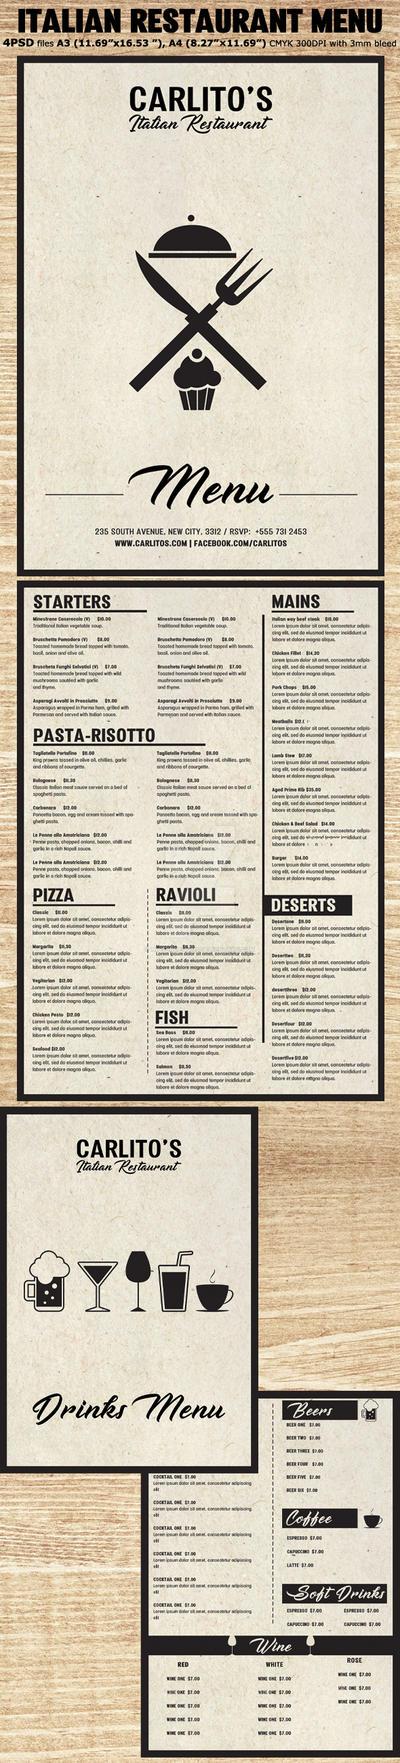 Italian Restaurant Menu Template by Hotpindesigns